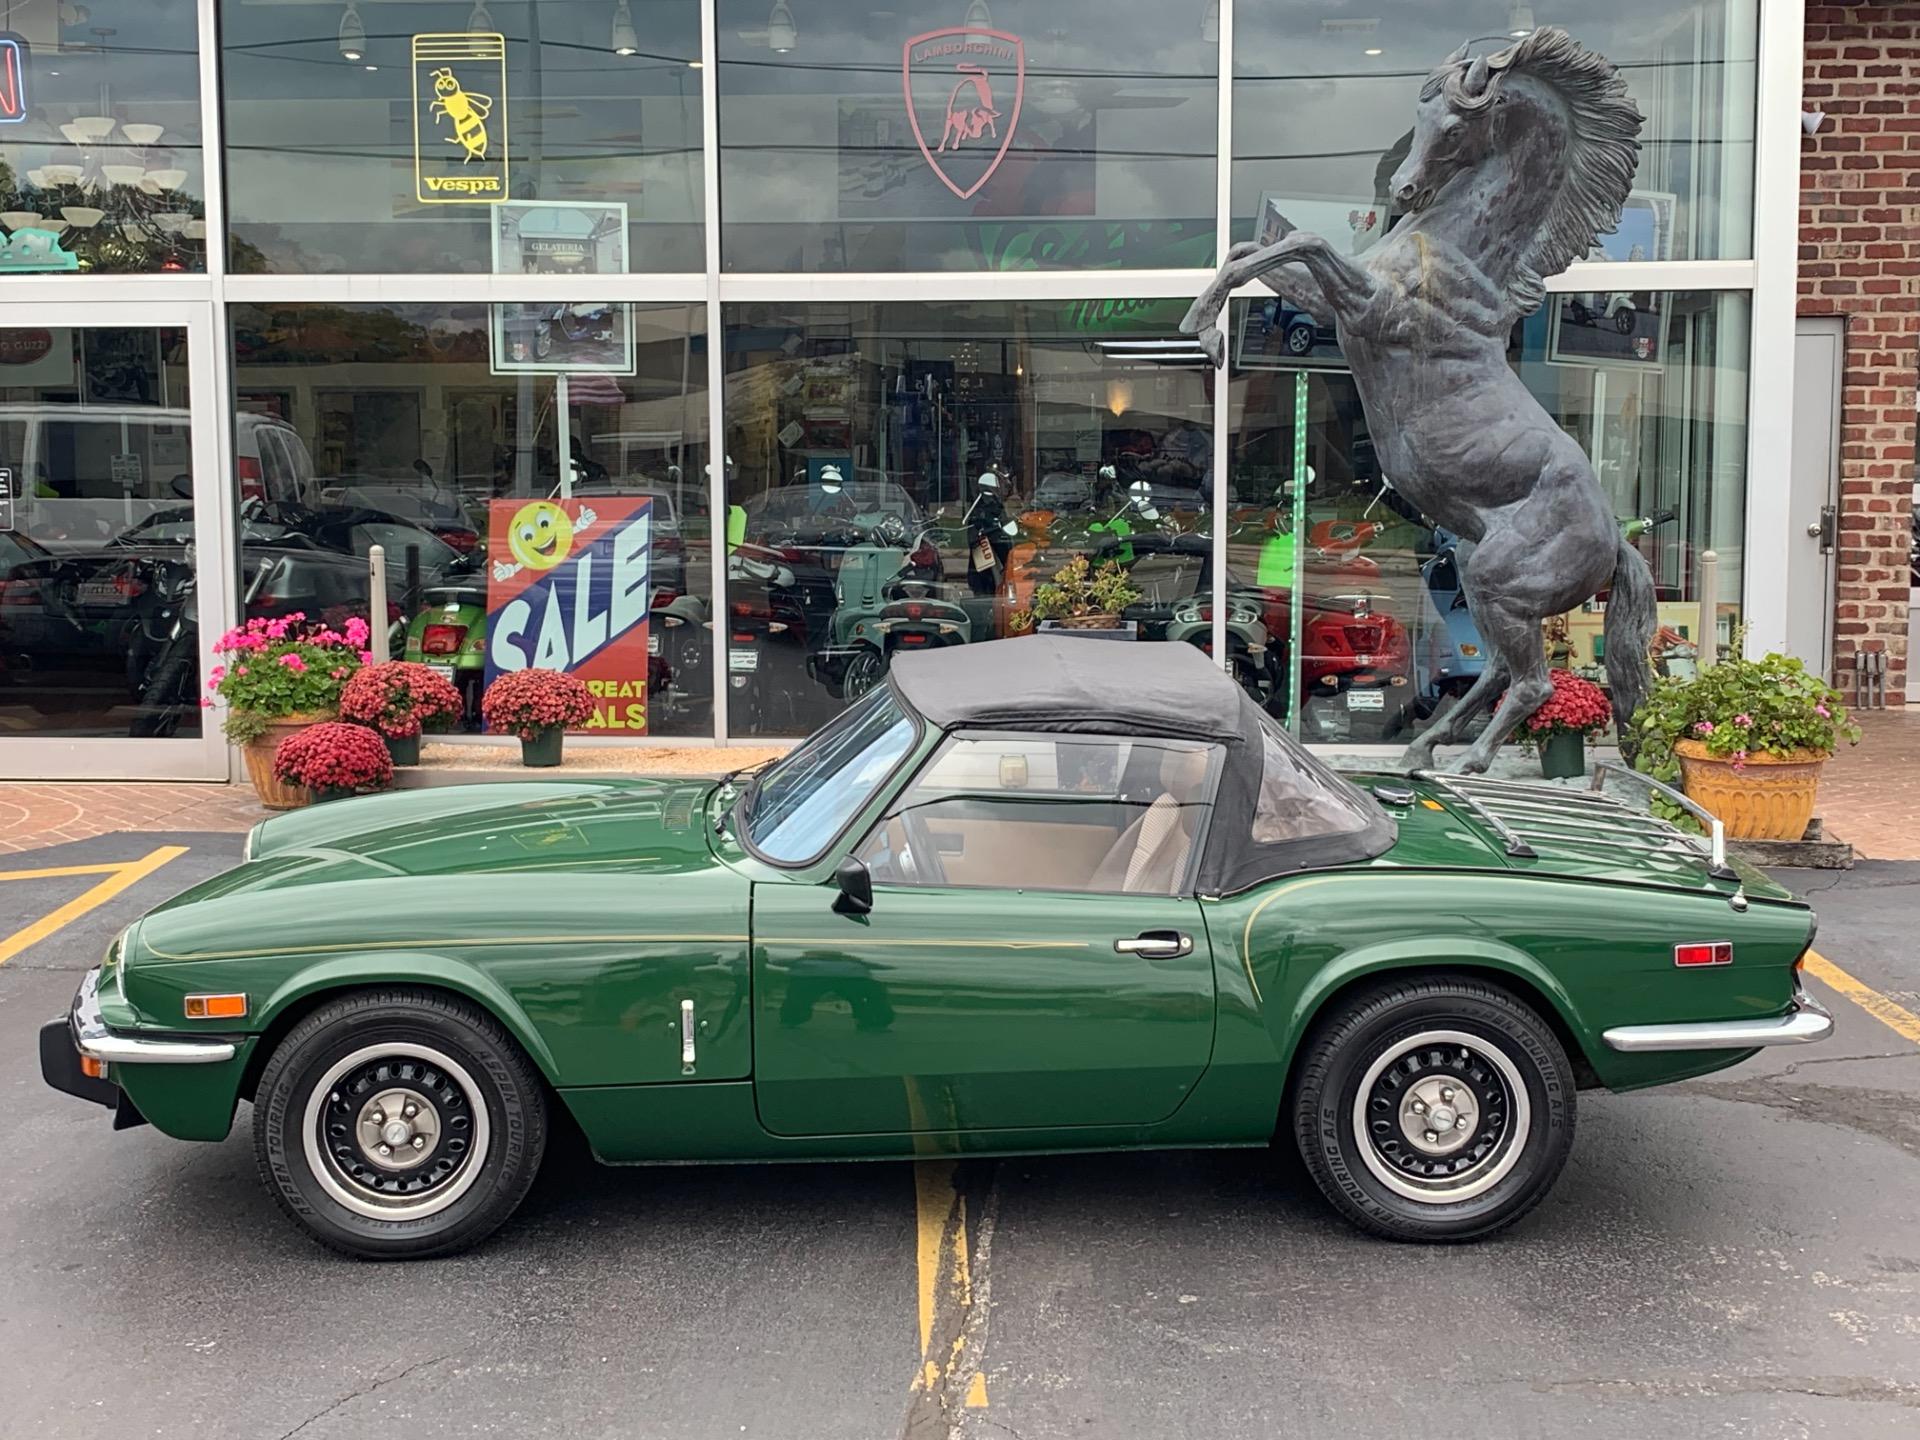 Used-1979-Triumph-Spitfire-1500